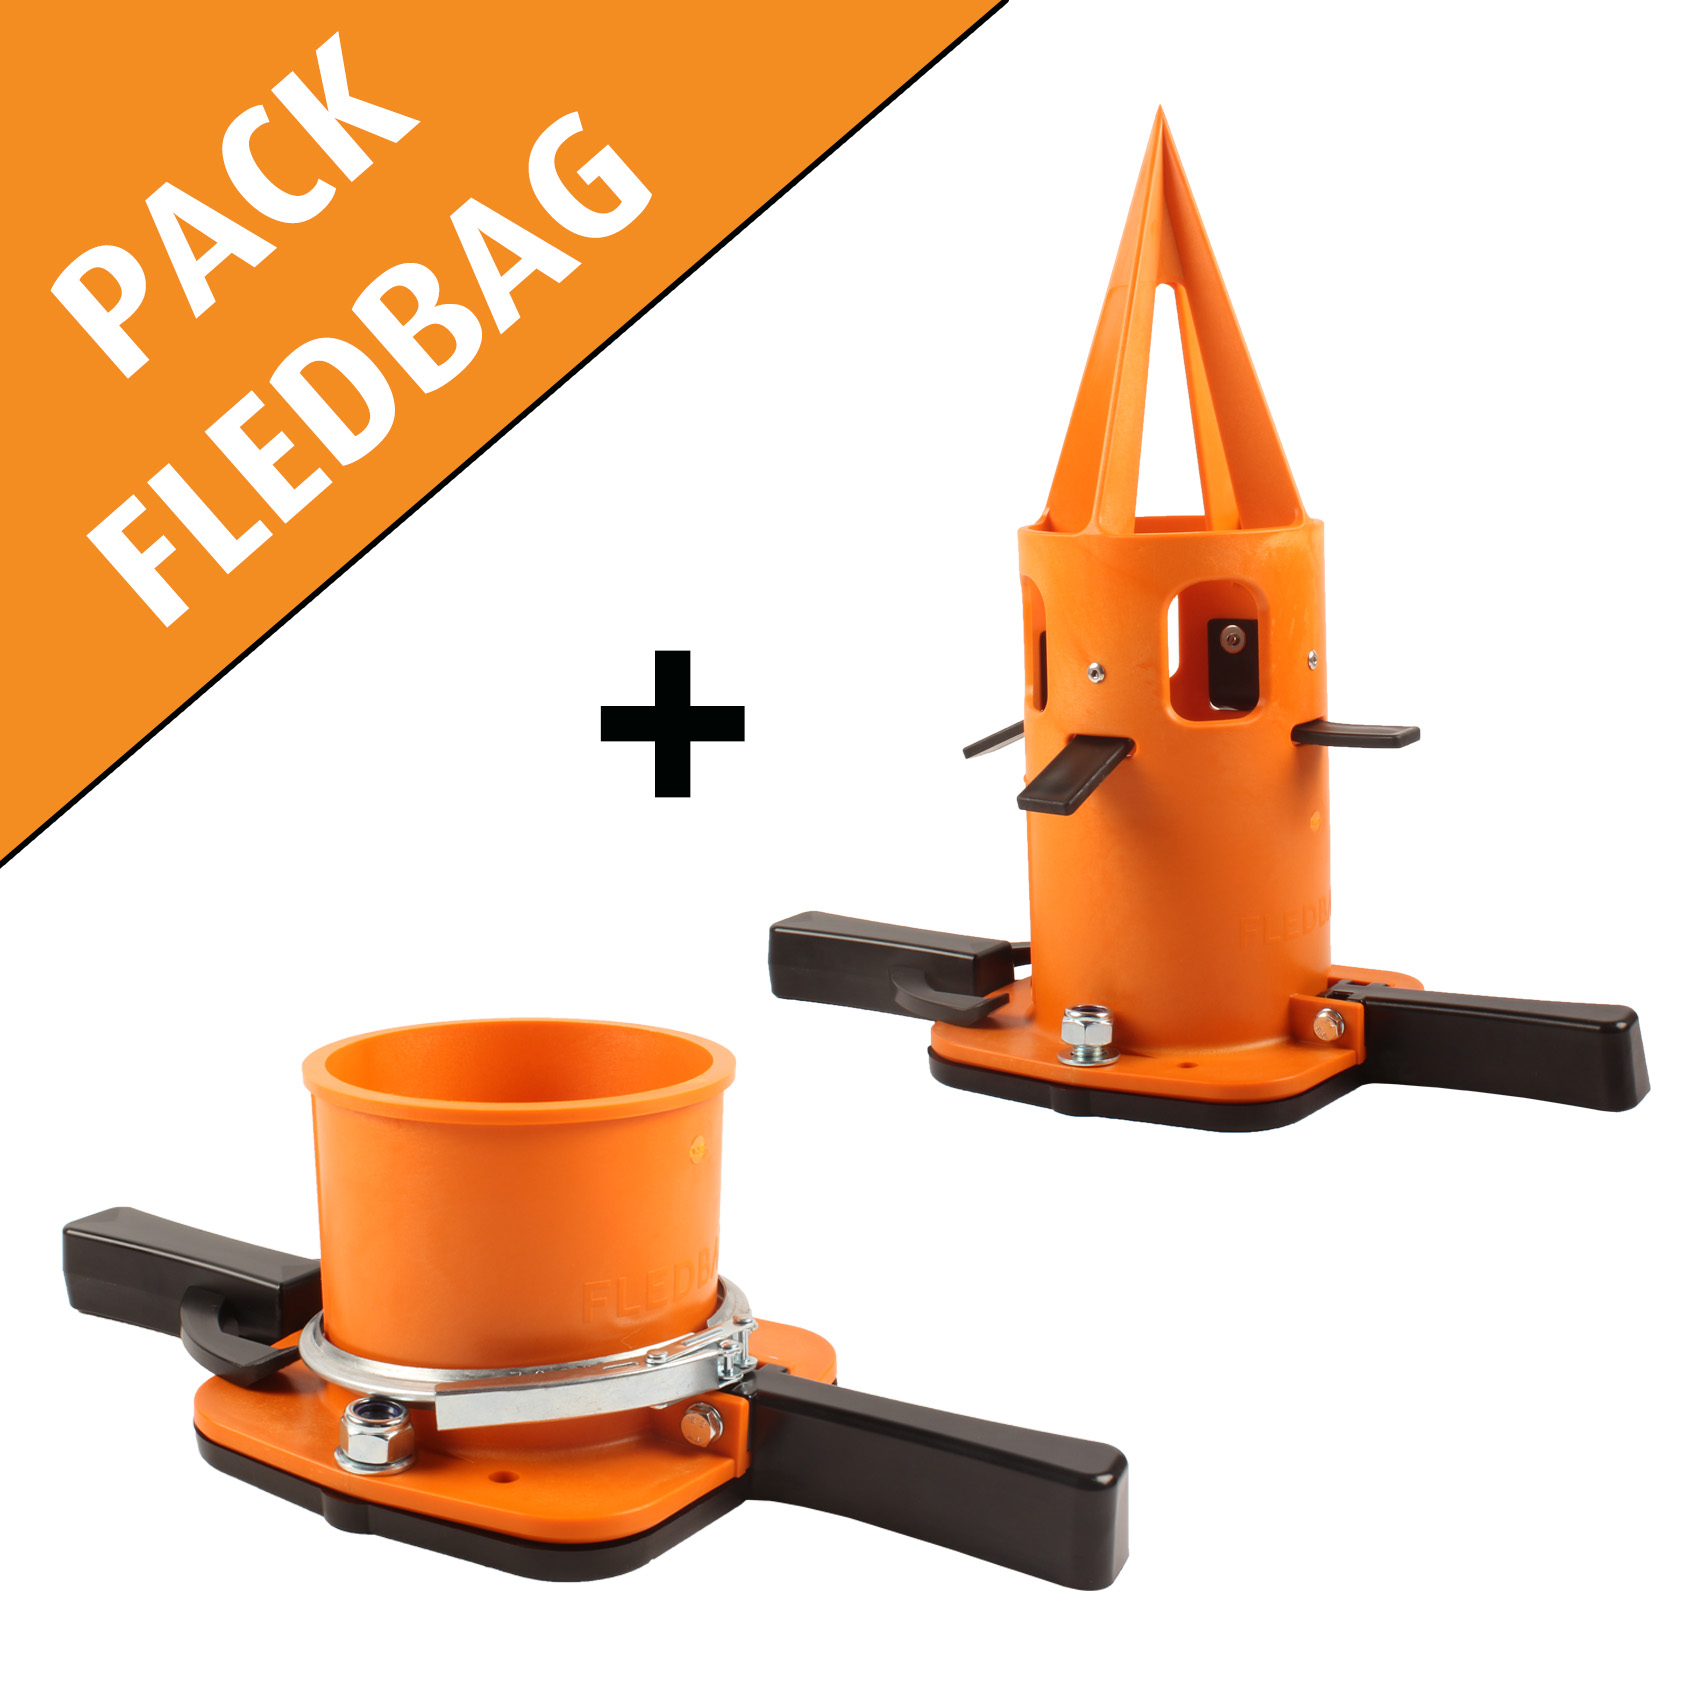 Combiné comprenant Feldbag ORIGINAL et EASY, doseur flexible pour big bag